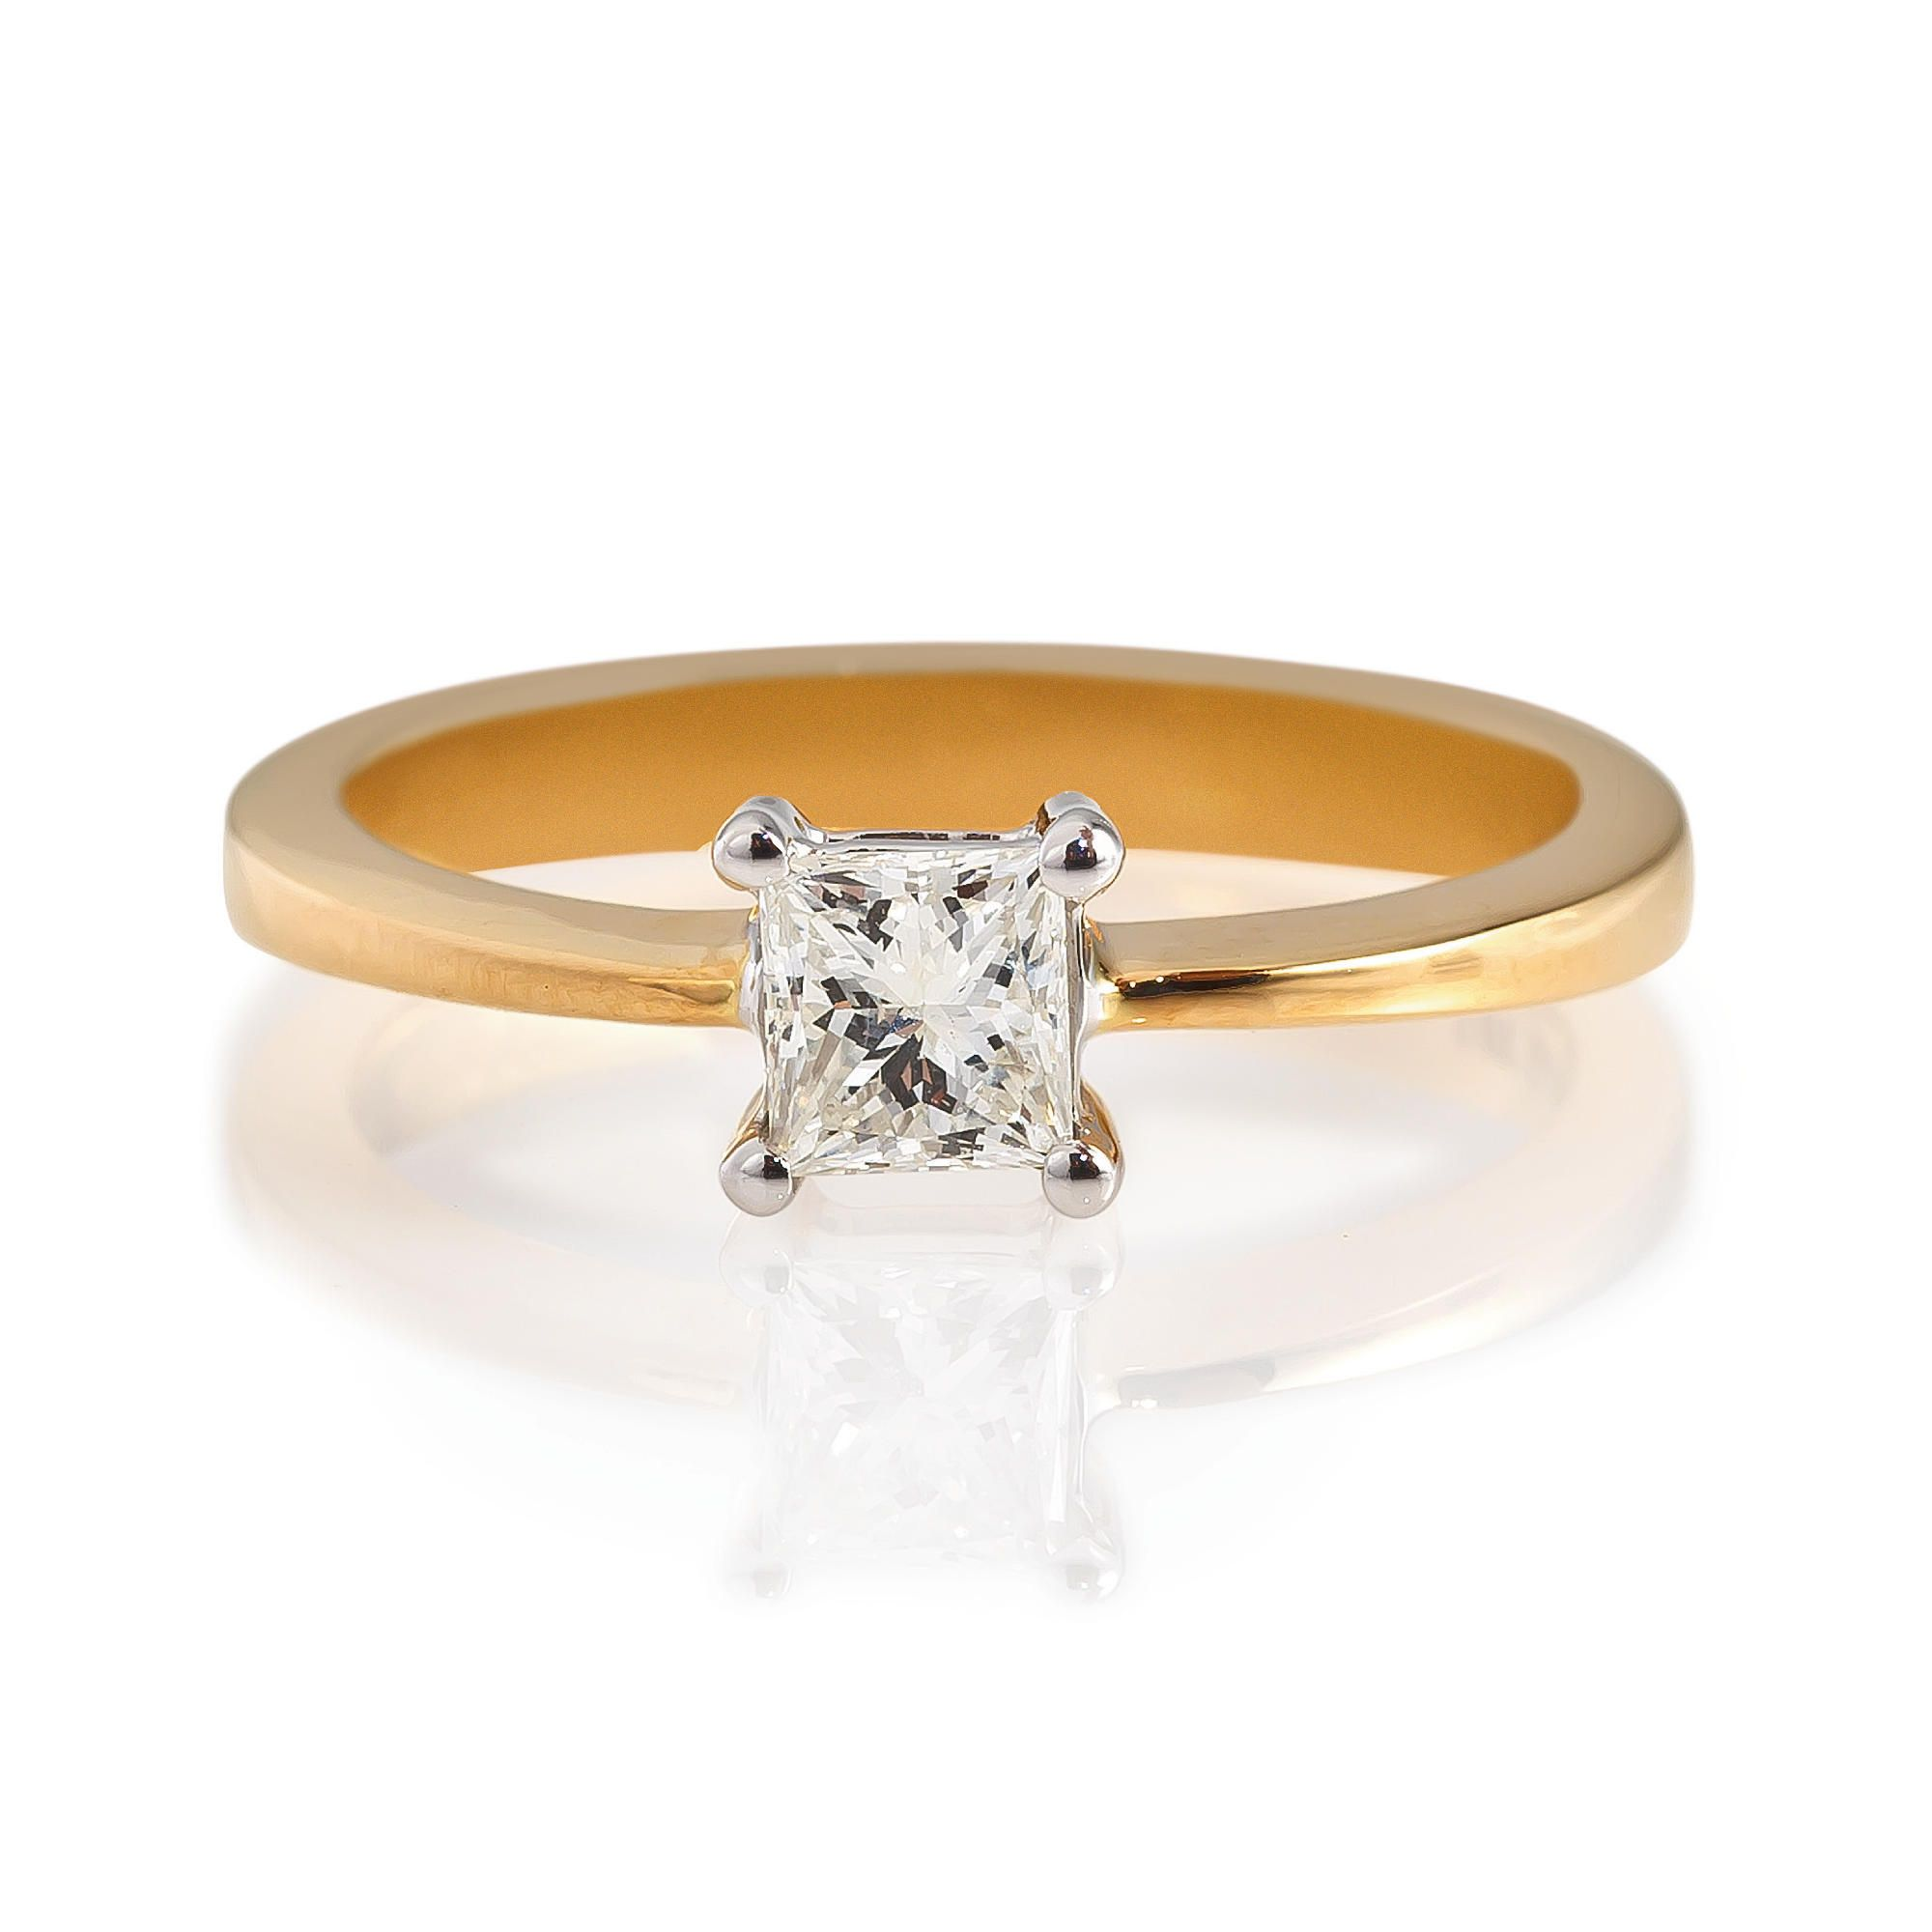 18ct Gold 1/2ct Diamond Princess Cut Ring, N at Tescos Direct